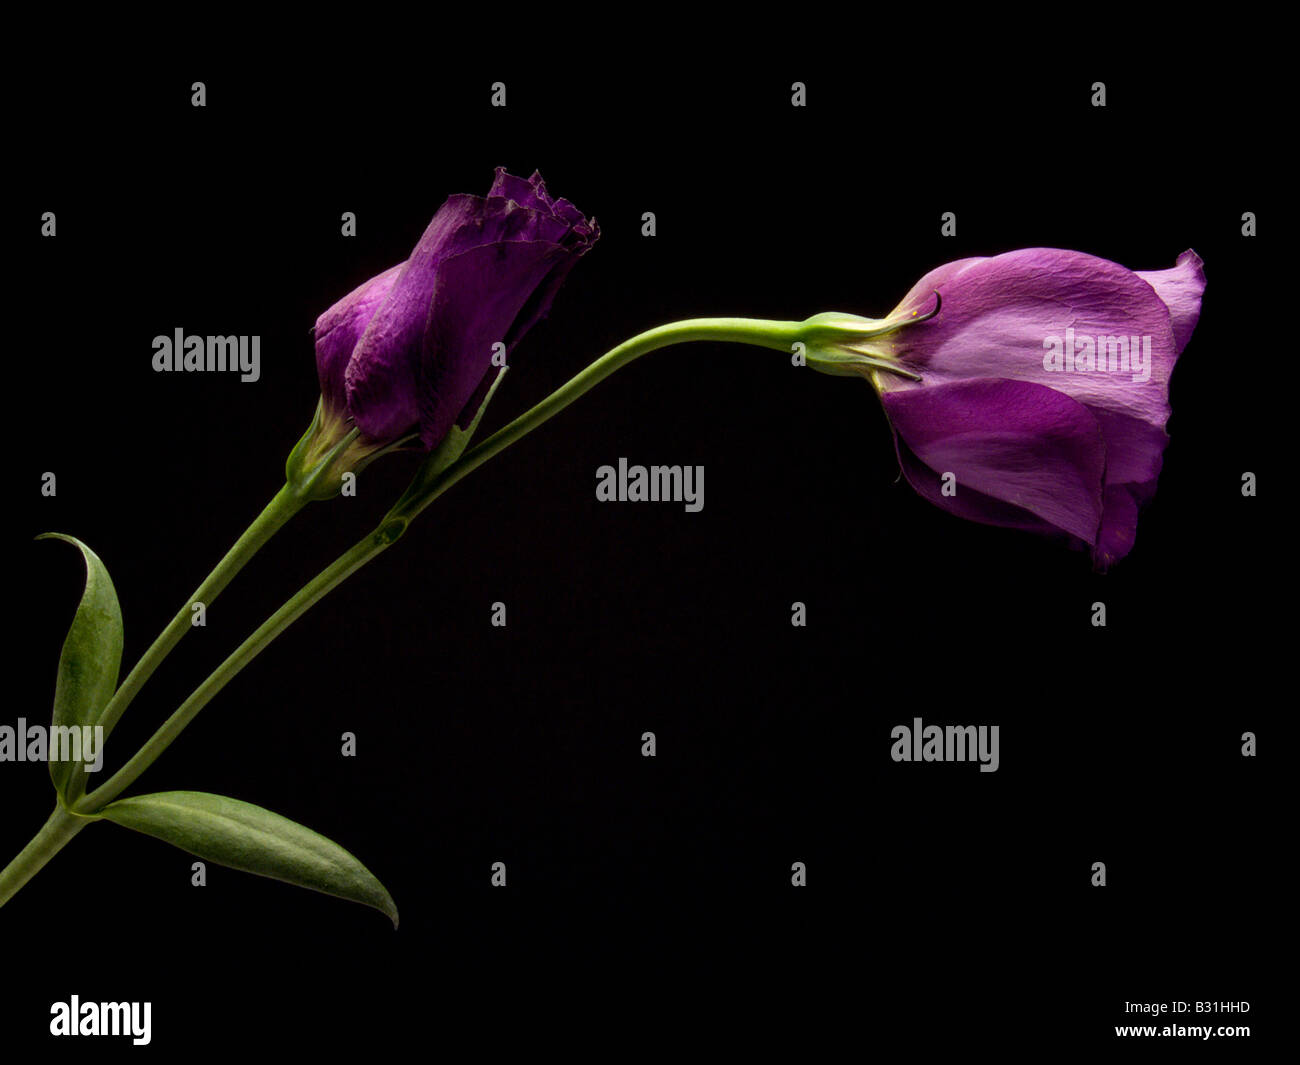 Two Purple Lisianthus on Black Background - Stock Image